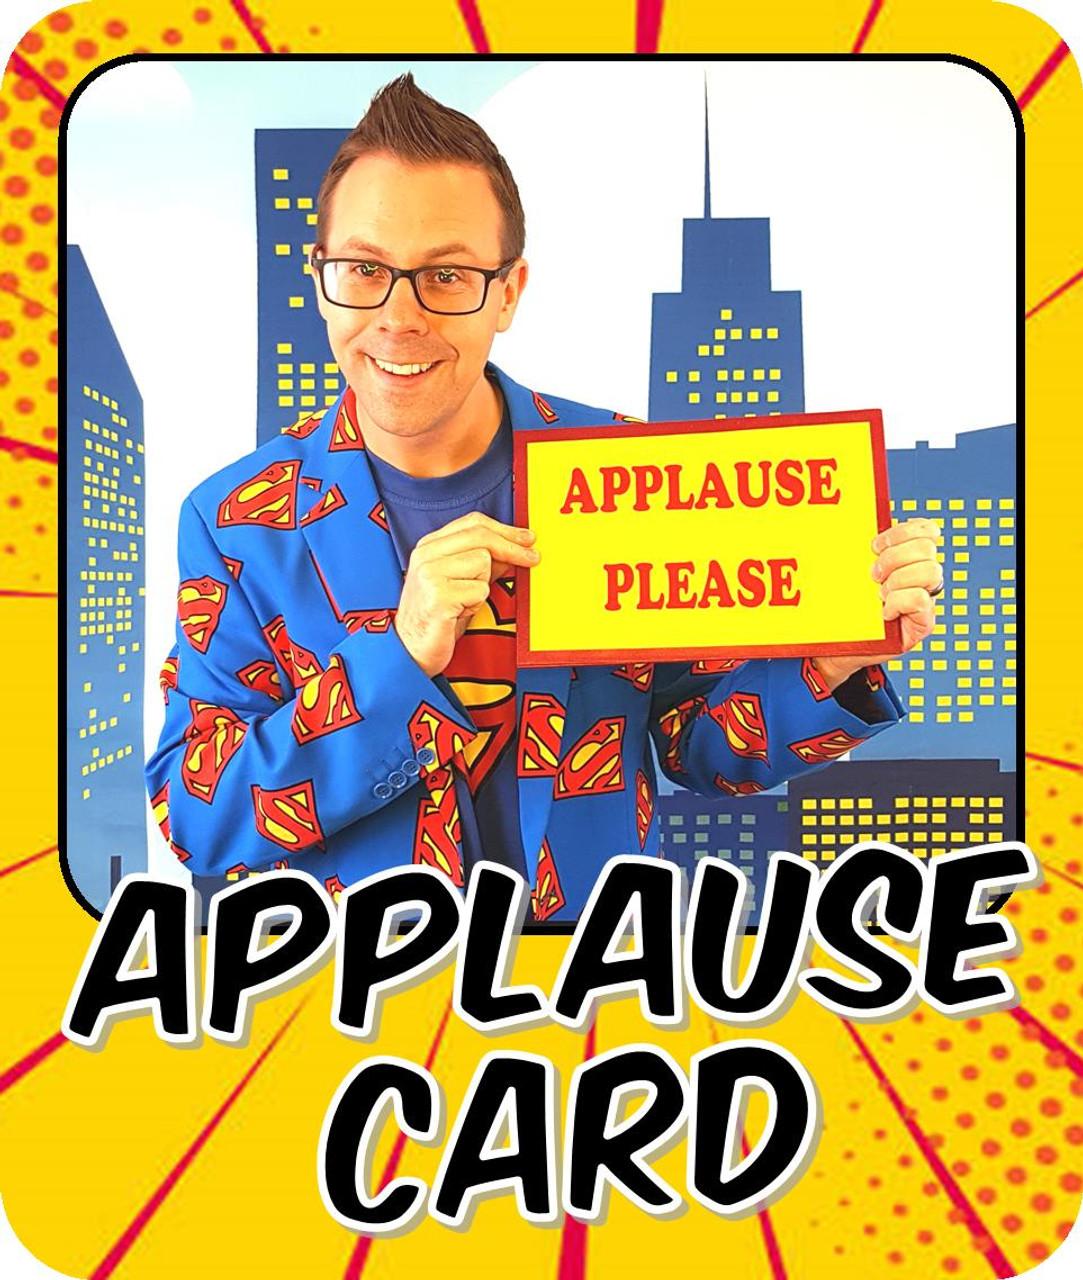 Applause Card Gag Joke Funny Magic Trick